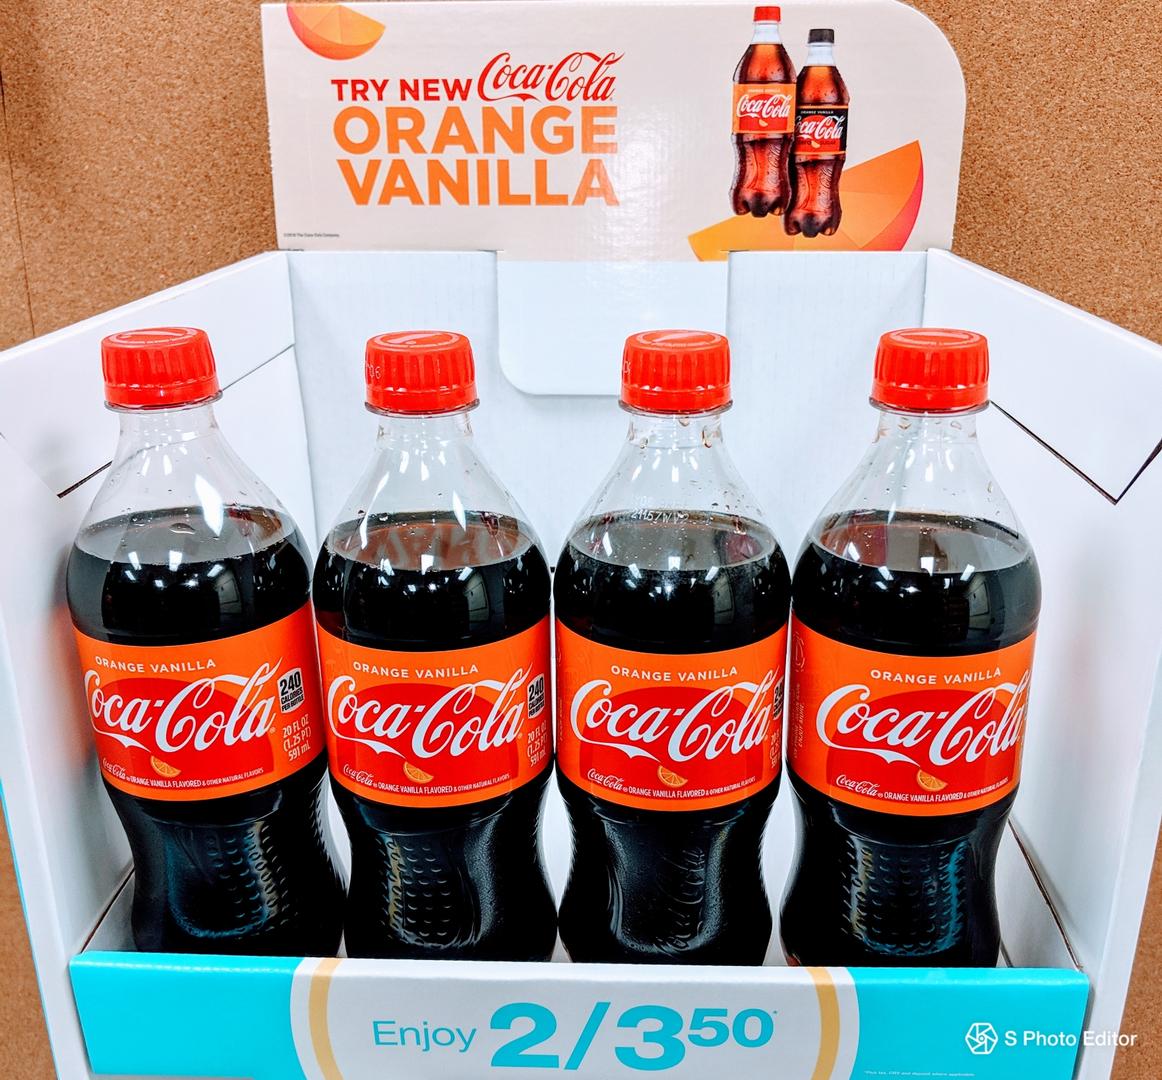 Durham Coca-cola Bottling Company in Durham, Nc